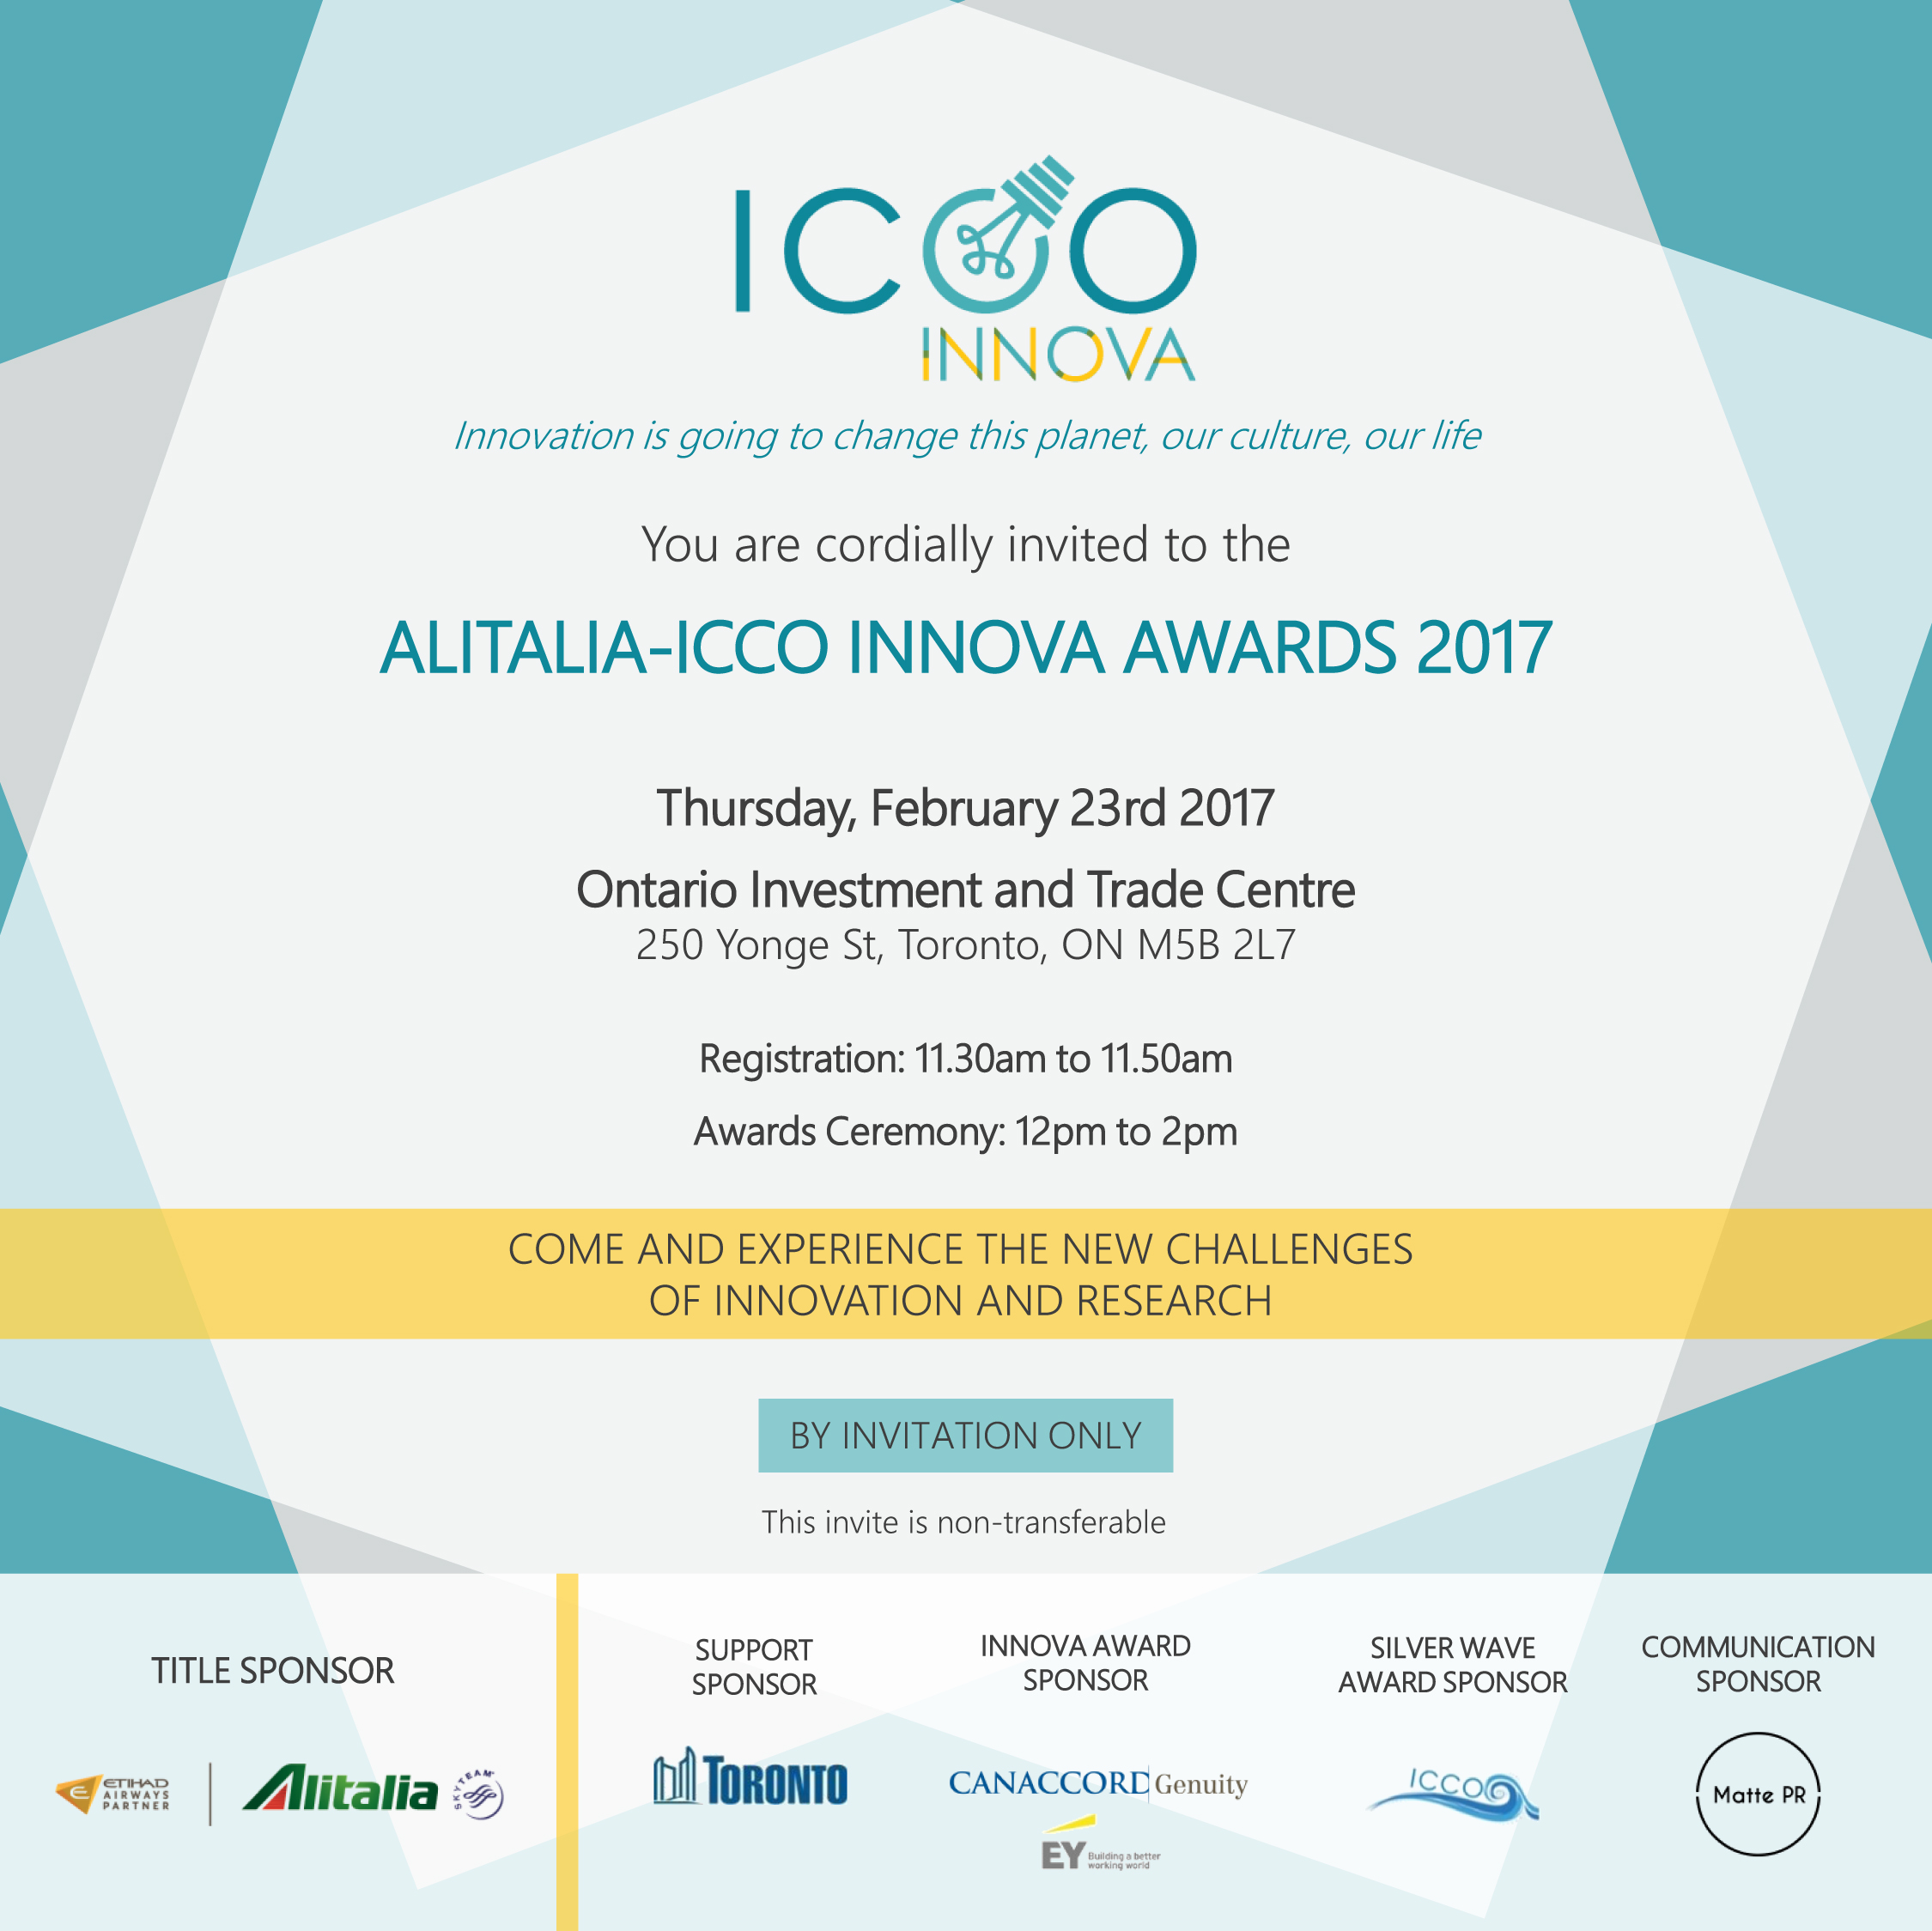 Alitalia ICCO Innova Awards 2017